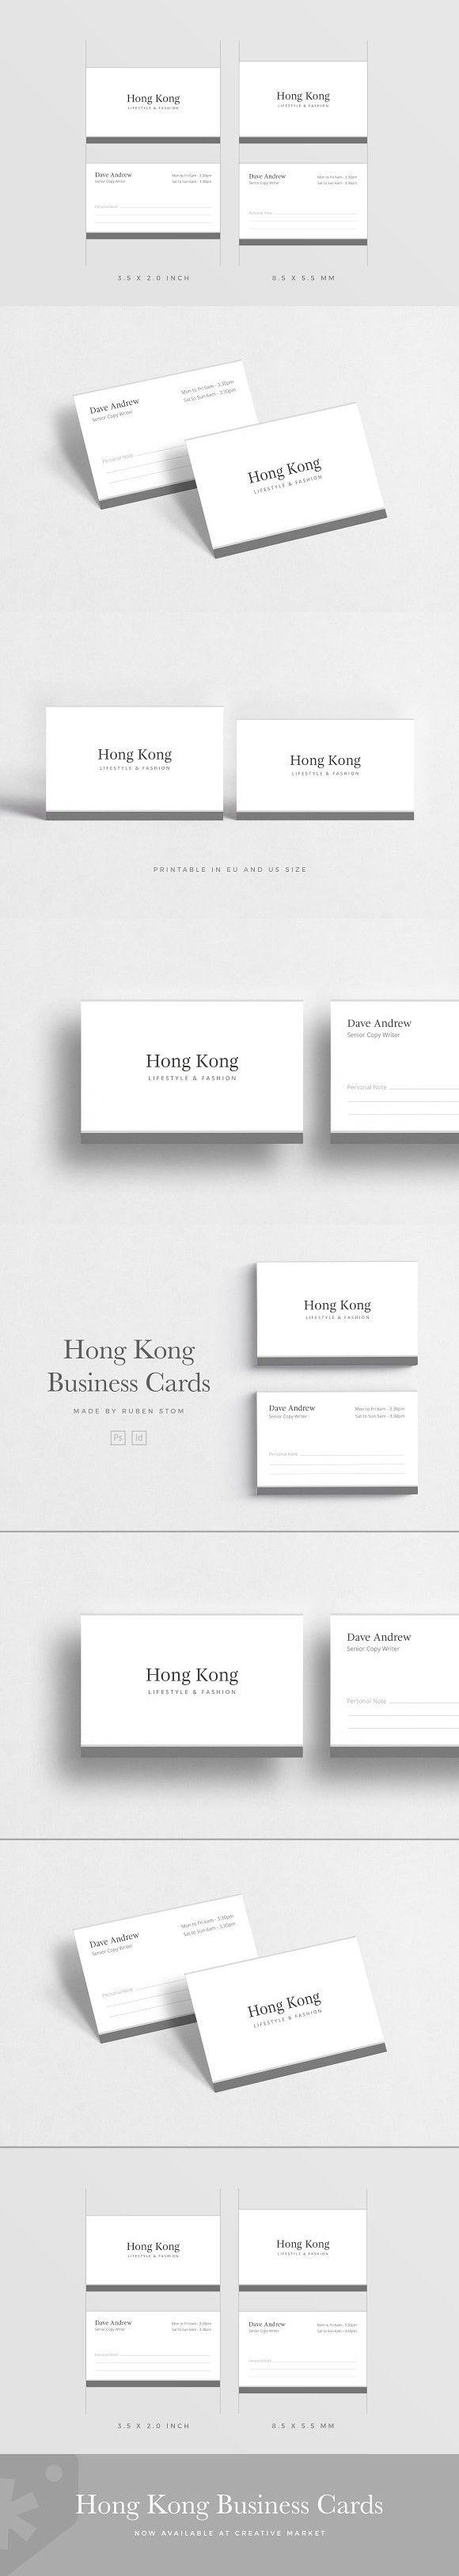 Hong Kong Business Card Elegant Business Cards Cards Indesign Templates